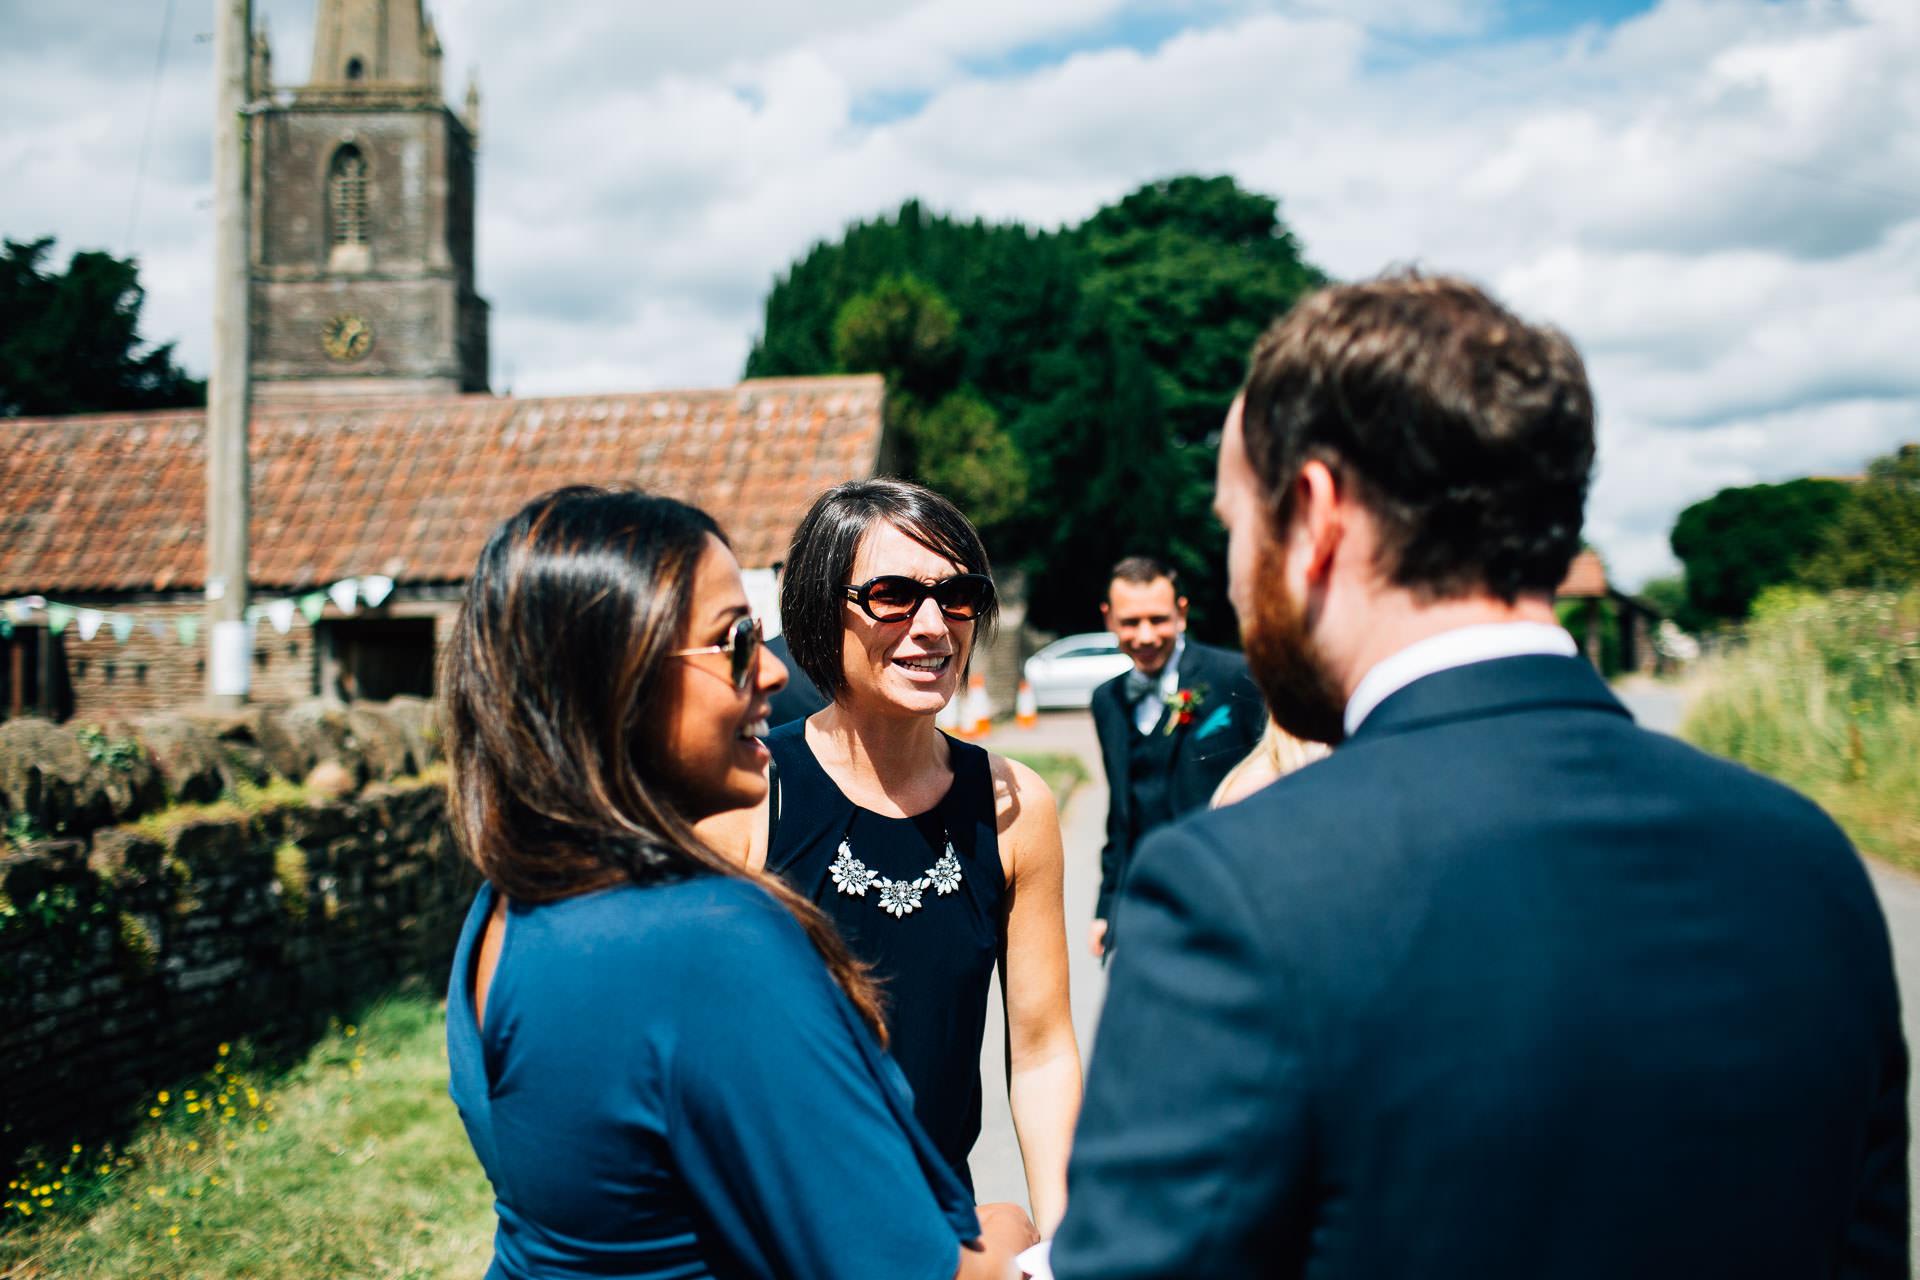 winterbourne-medieval-barn-wedding-photography-emma-andrew-32